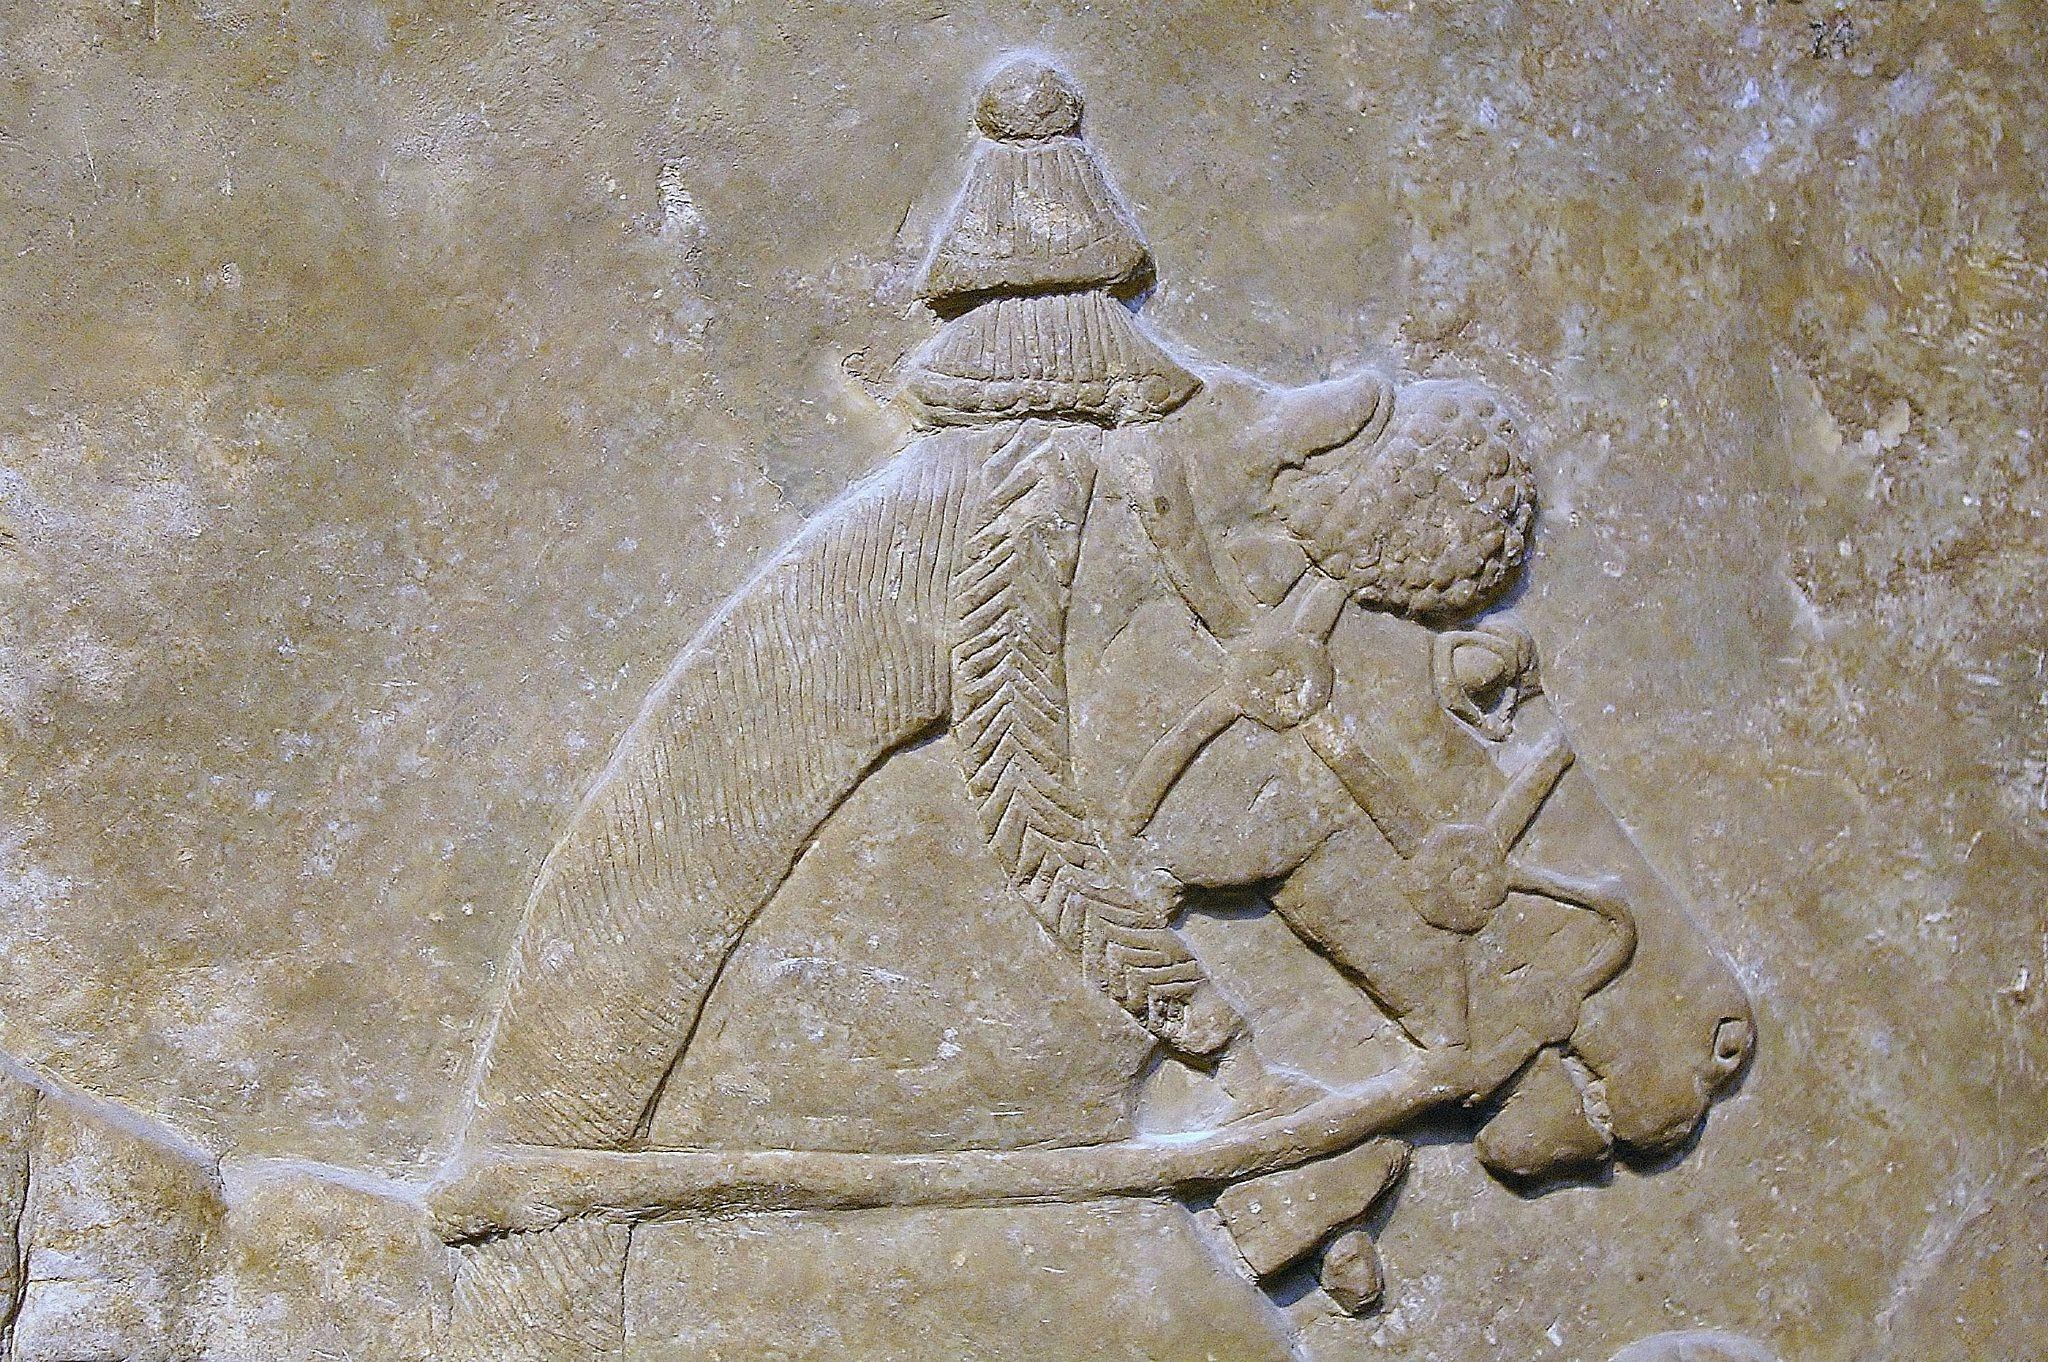 British Museum by melaniehartshorn40